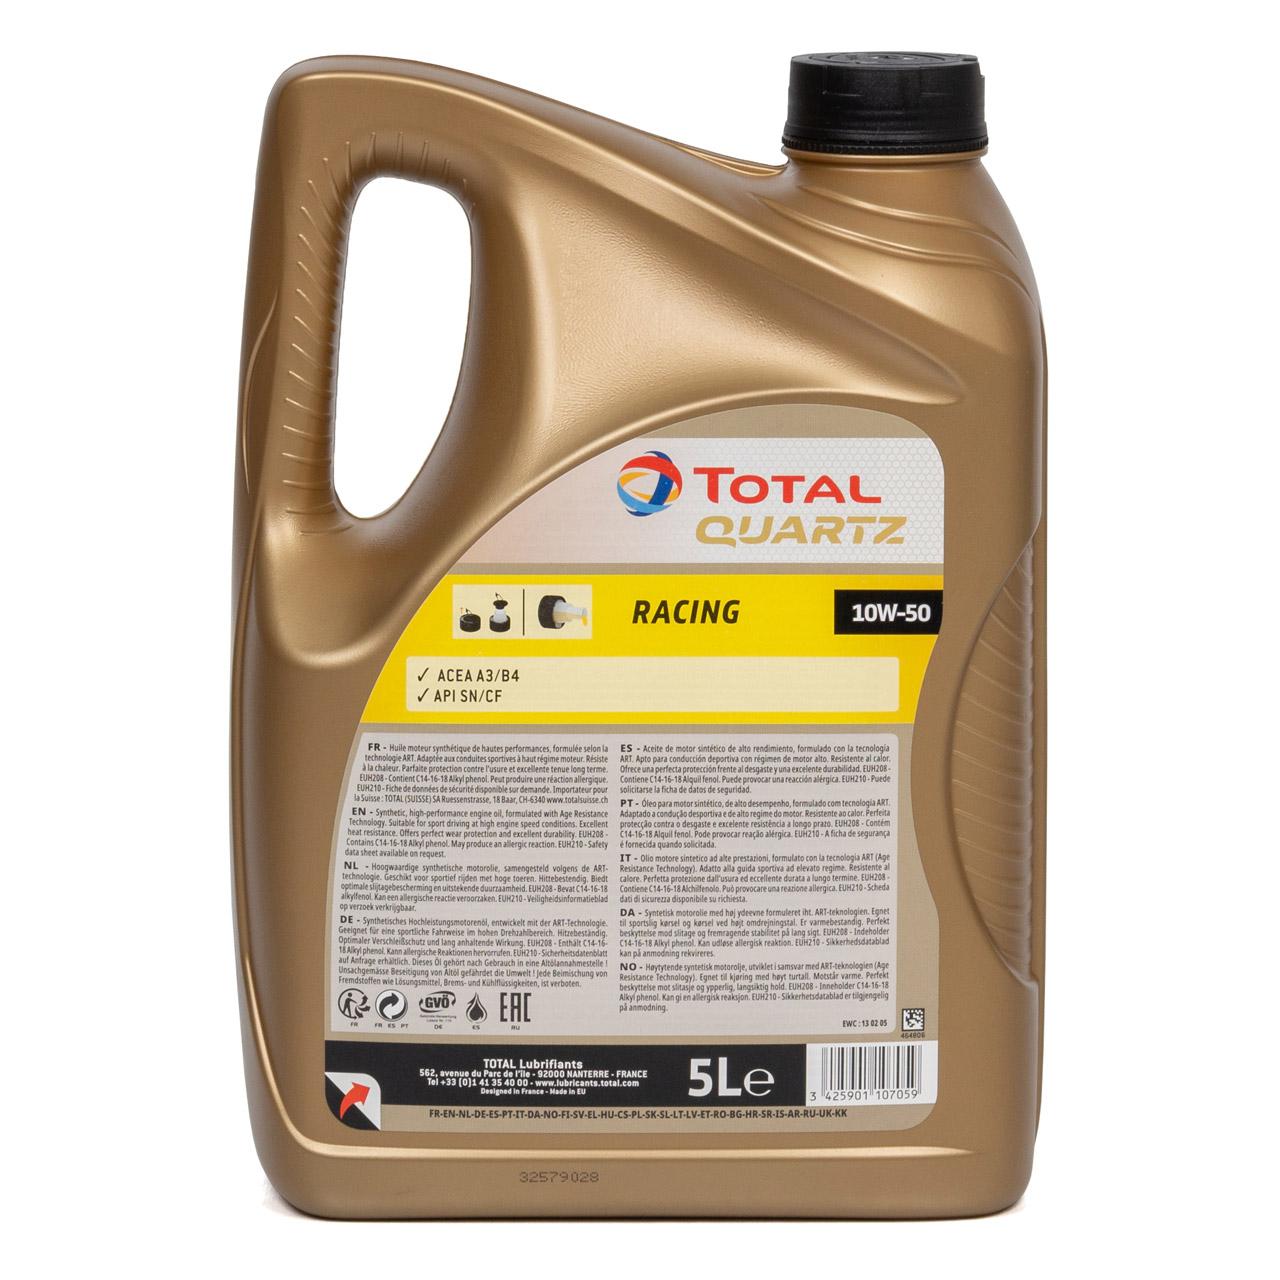 TOTAL QUARTZ RACING 10W-50 10W50 Motoröl Öl ACEA A3/B4 API SN/CF - 5L 5 Liter